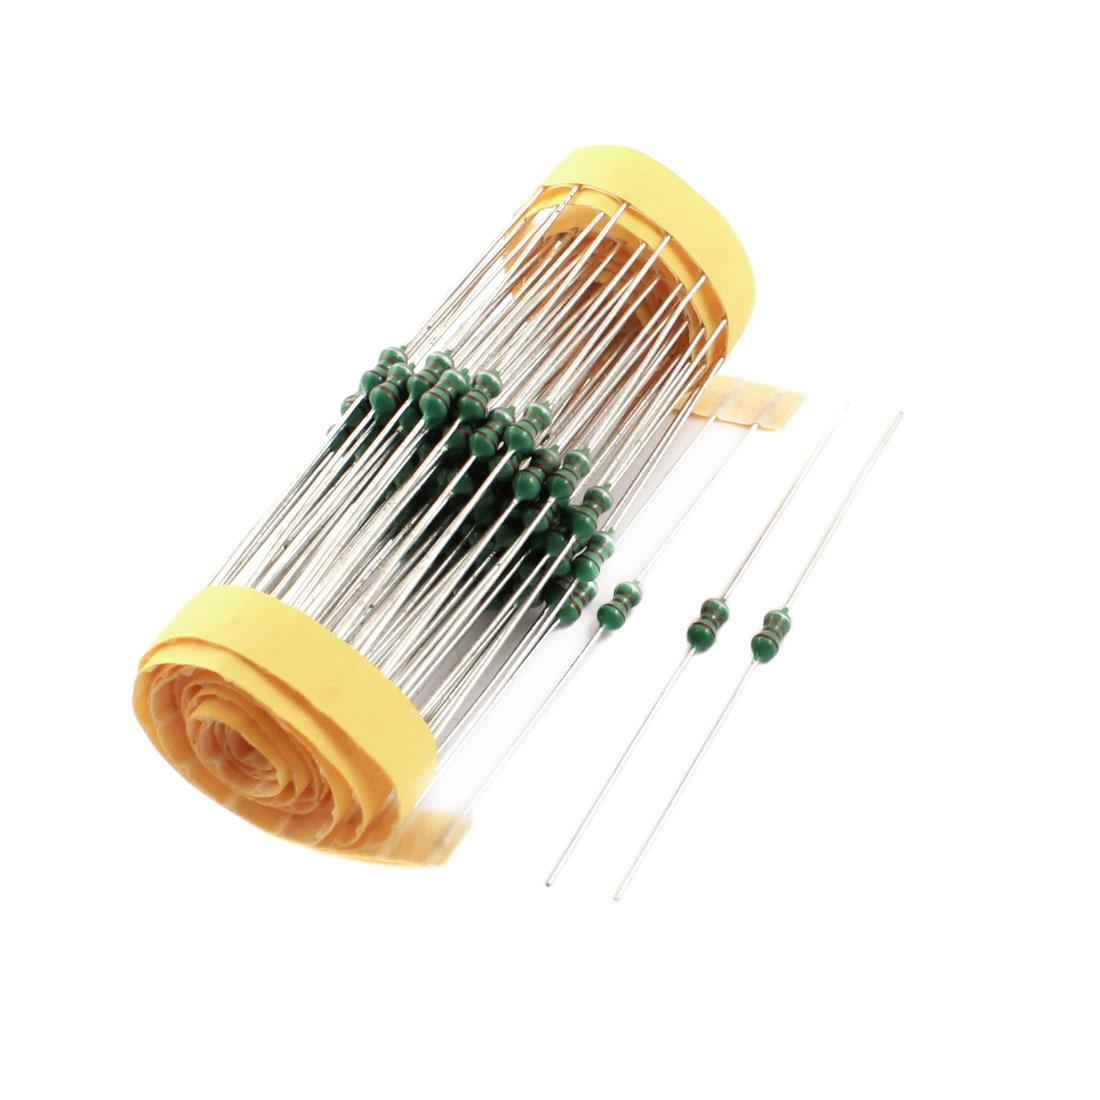 100Pcs Motherboard Parts 1/4W 2.2uH 10% Color Ring Inductors 0307 3x7mm